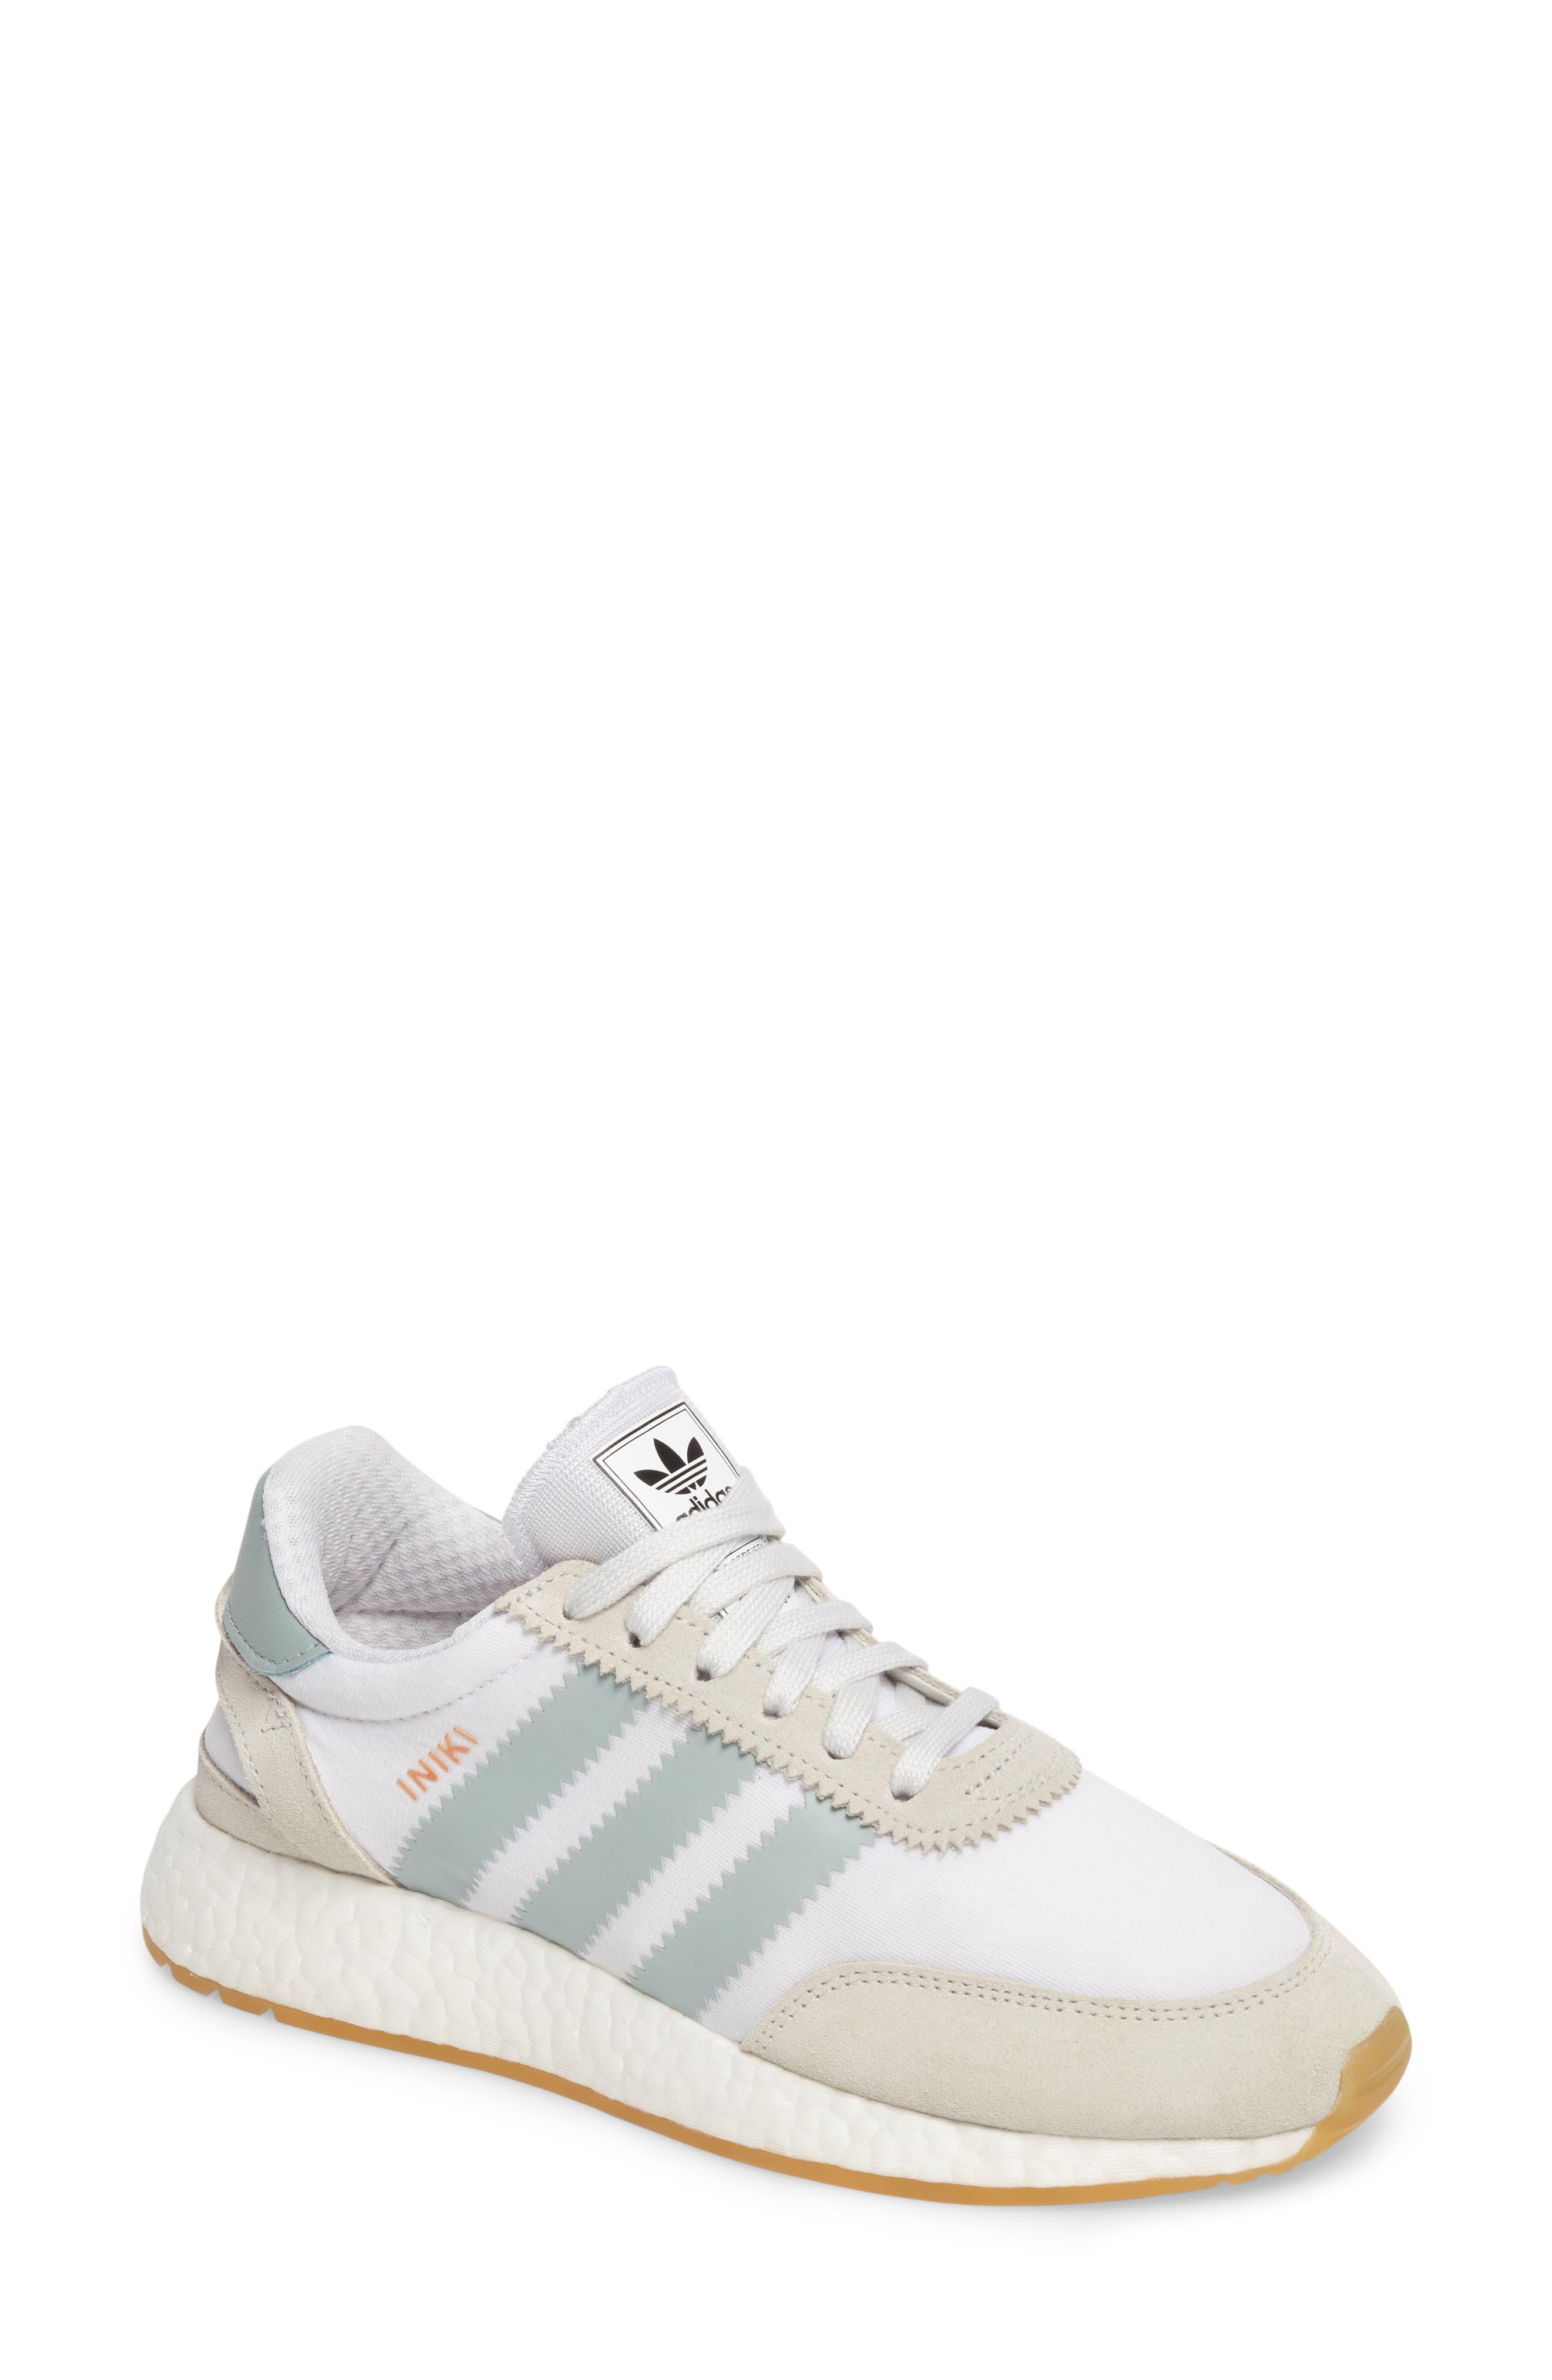 Adidas Originals Iniki Runner sneaker, blanco / verde / Gum táctil